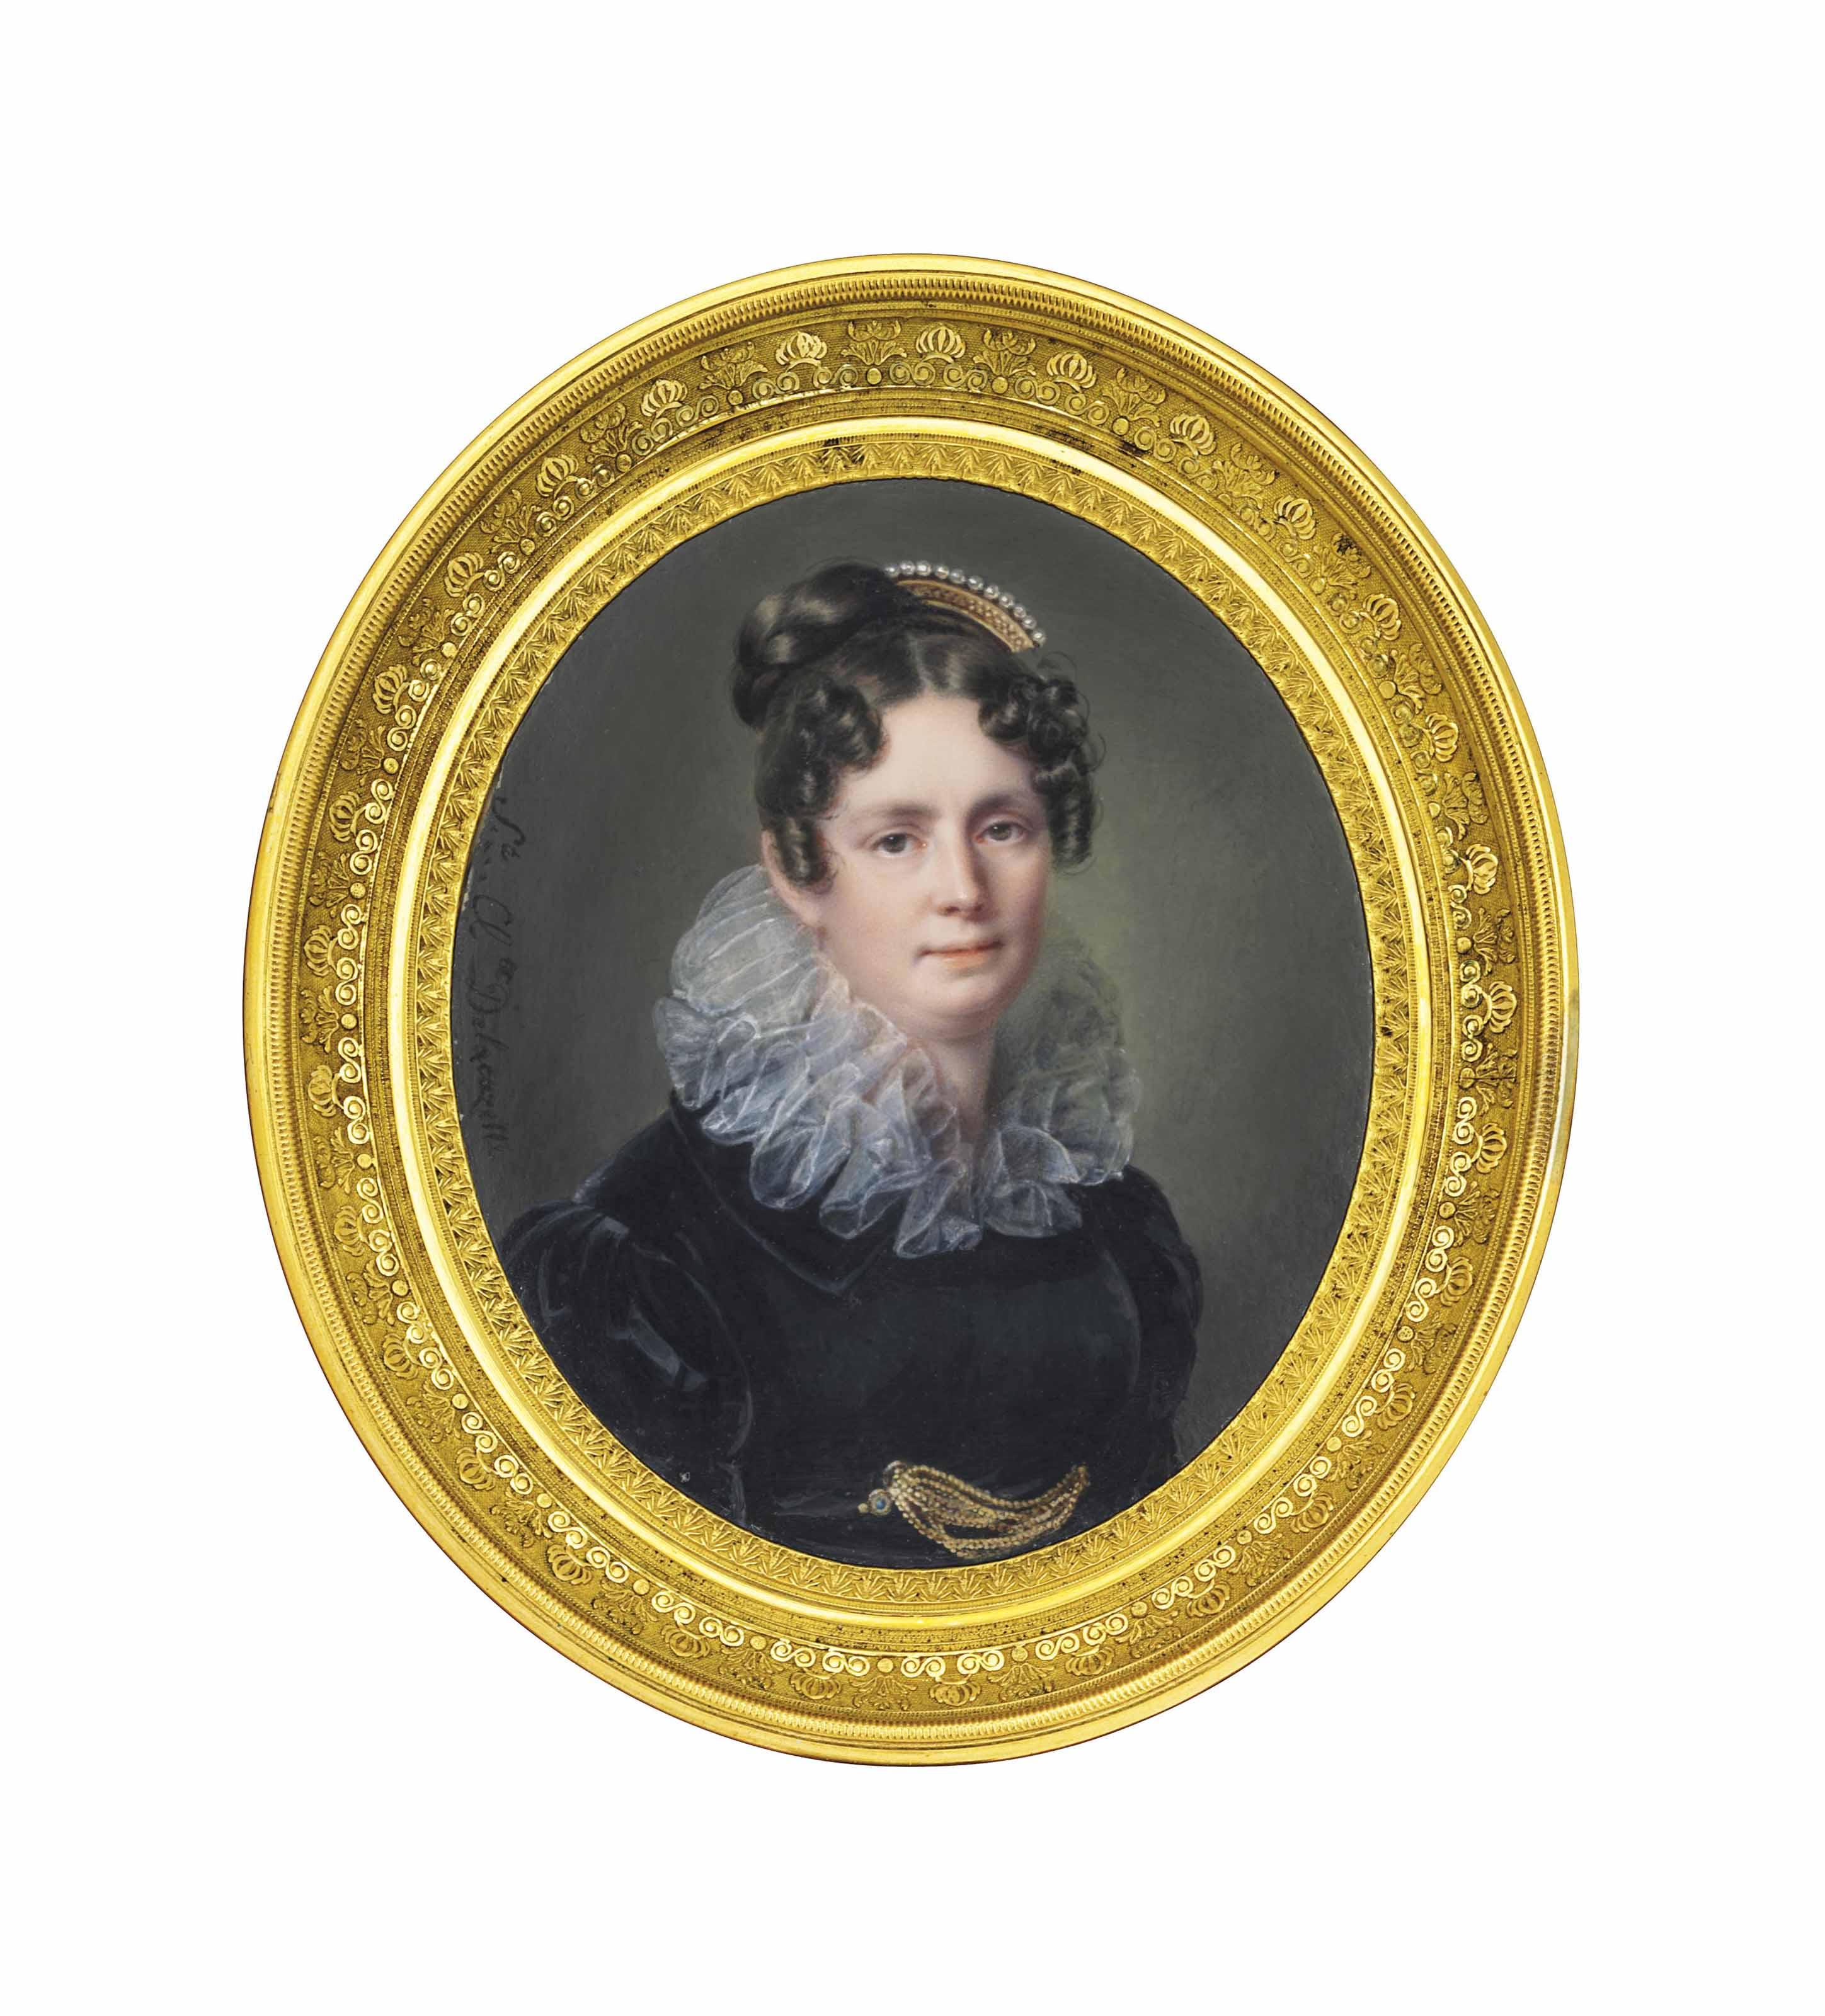 SOPHIE CLÉMENCE DELACAZETTE (FRENCH, 1774-1854)